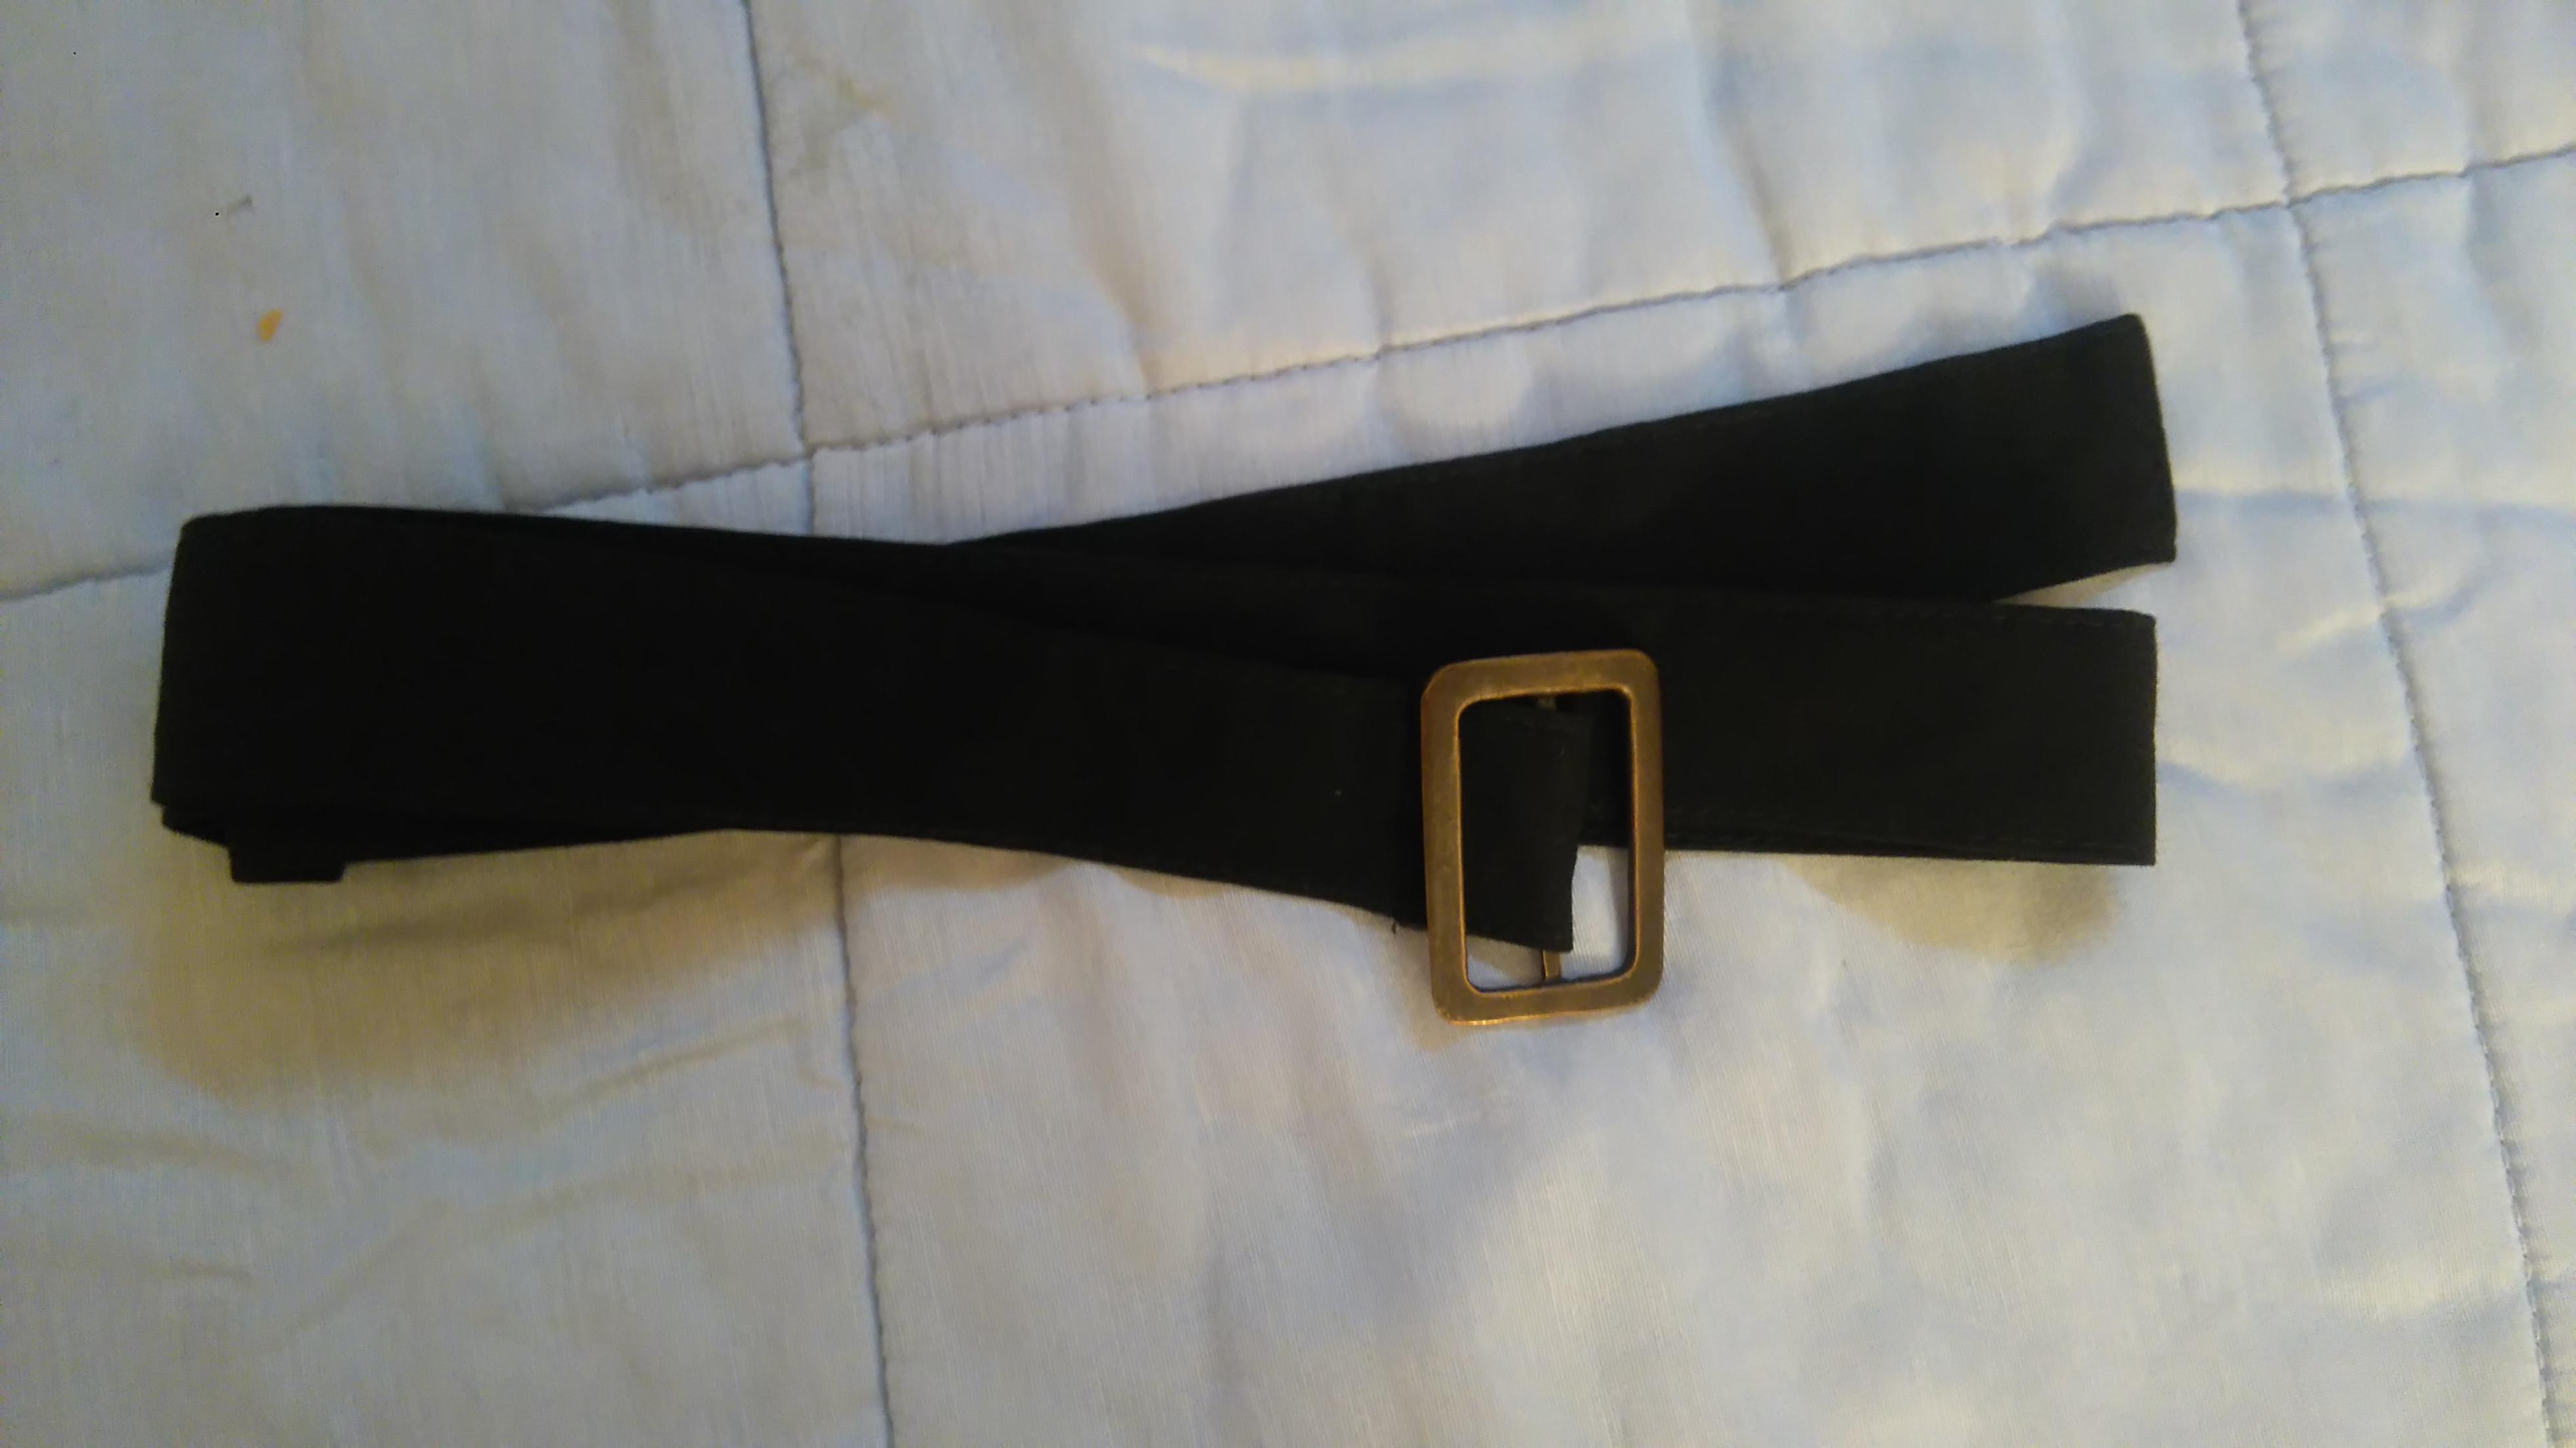 troc de troc ceinture en tissus image 0